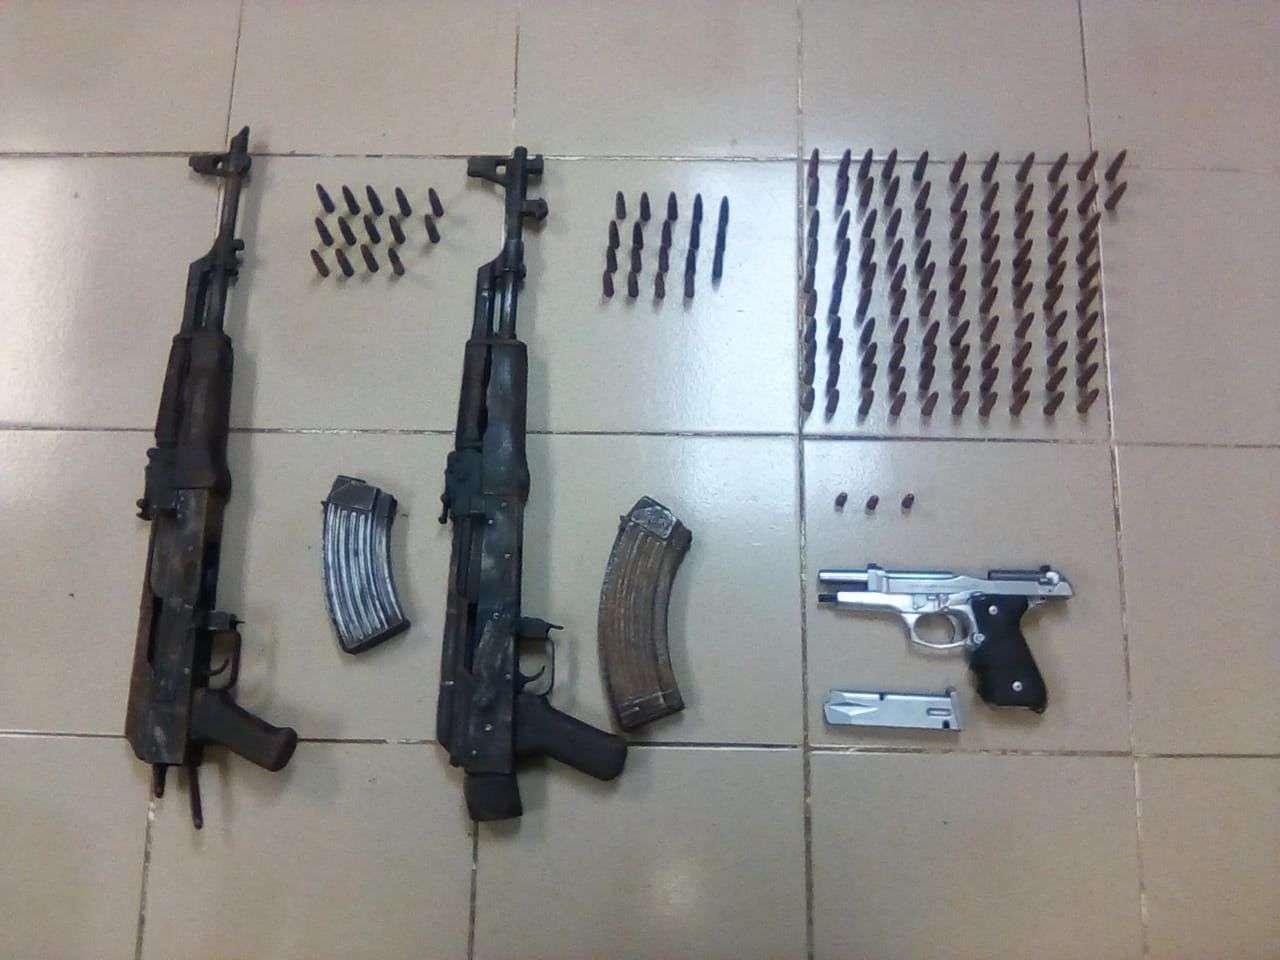 Armas abandonadas por mochileros. Foto/Senafront